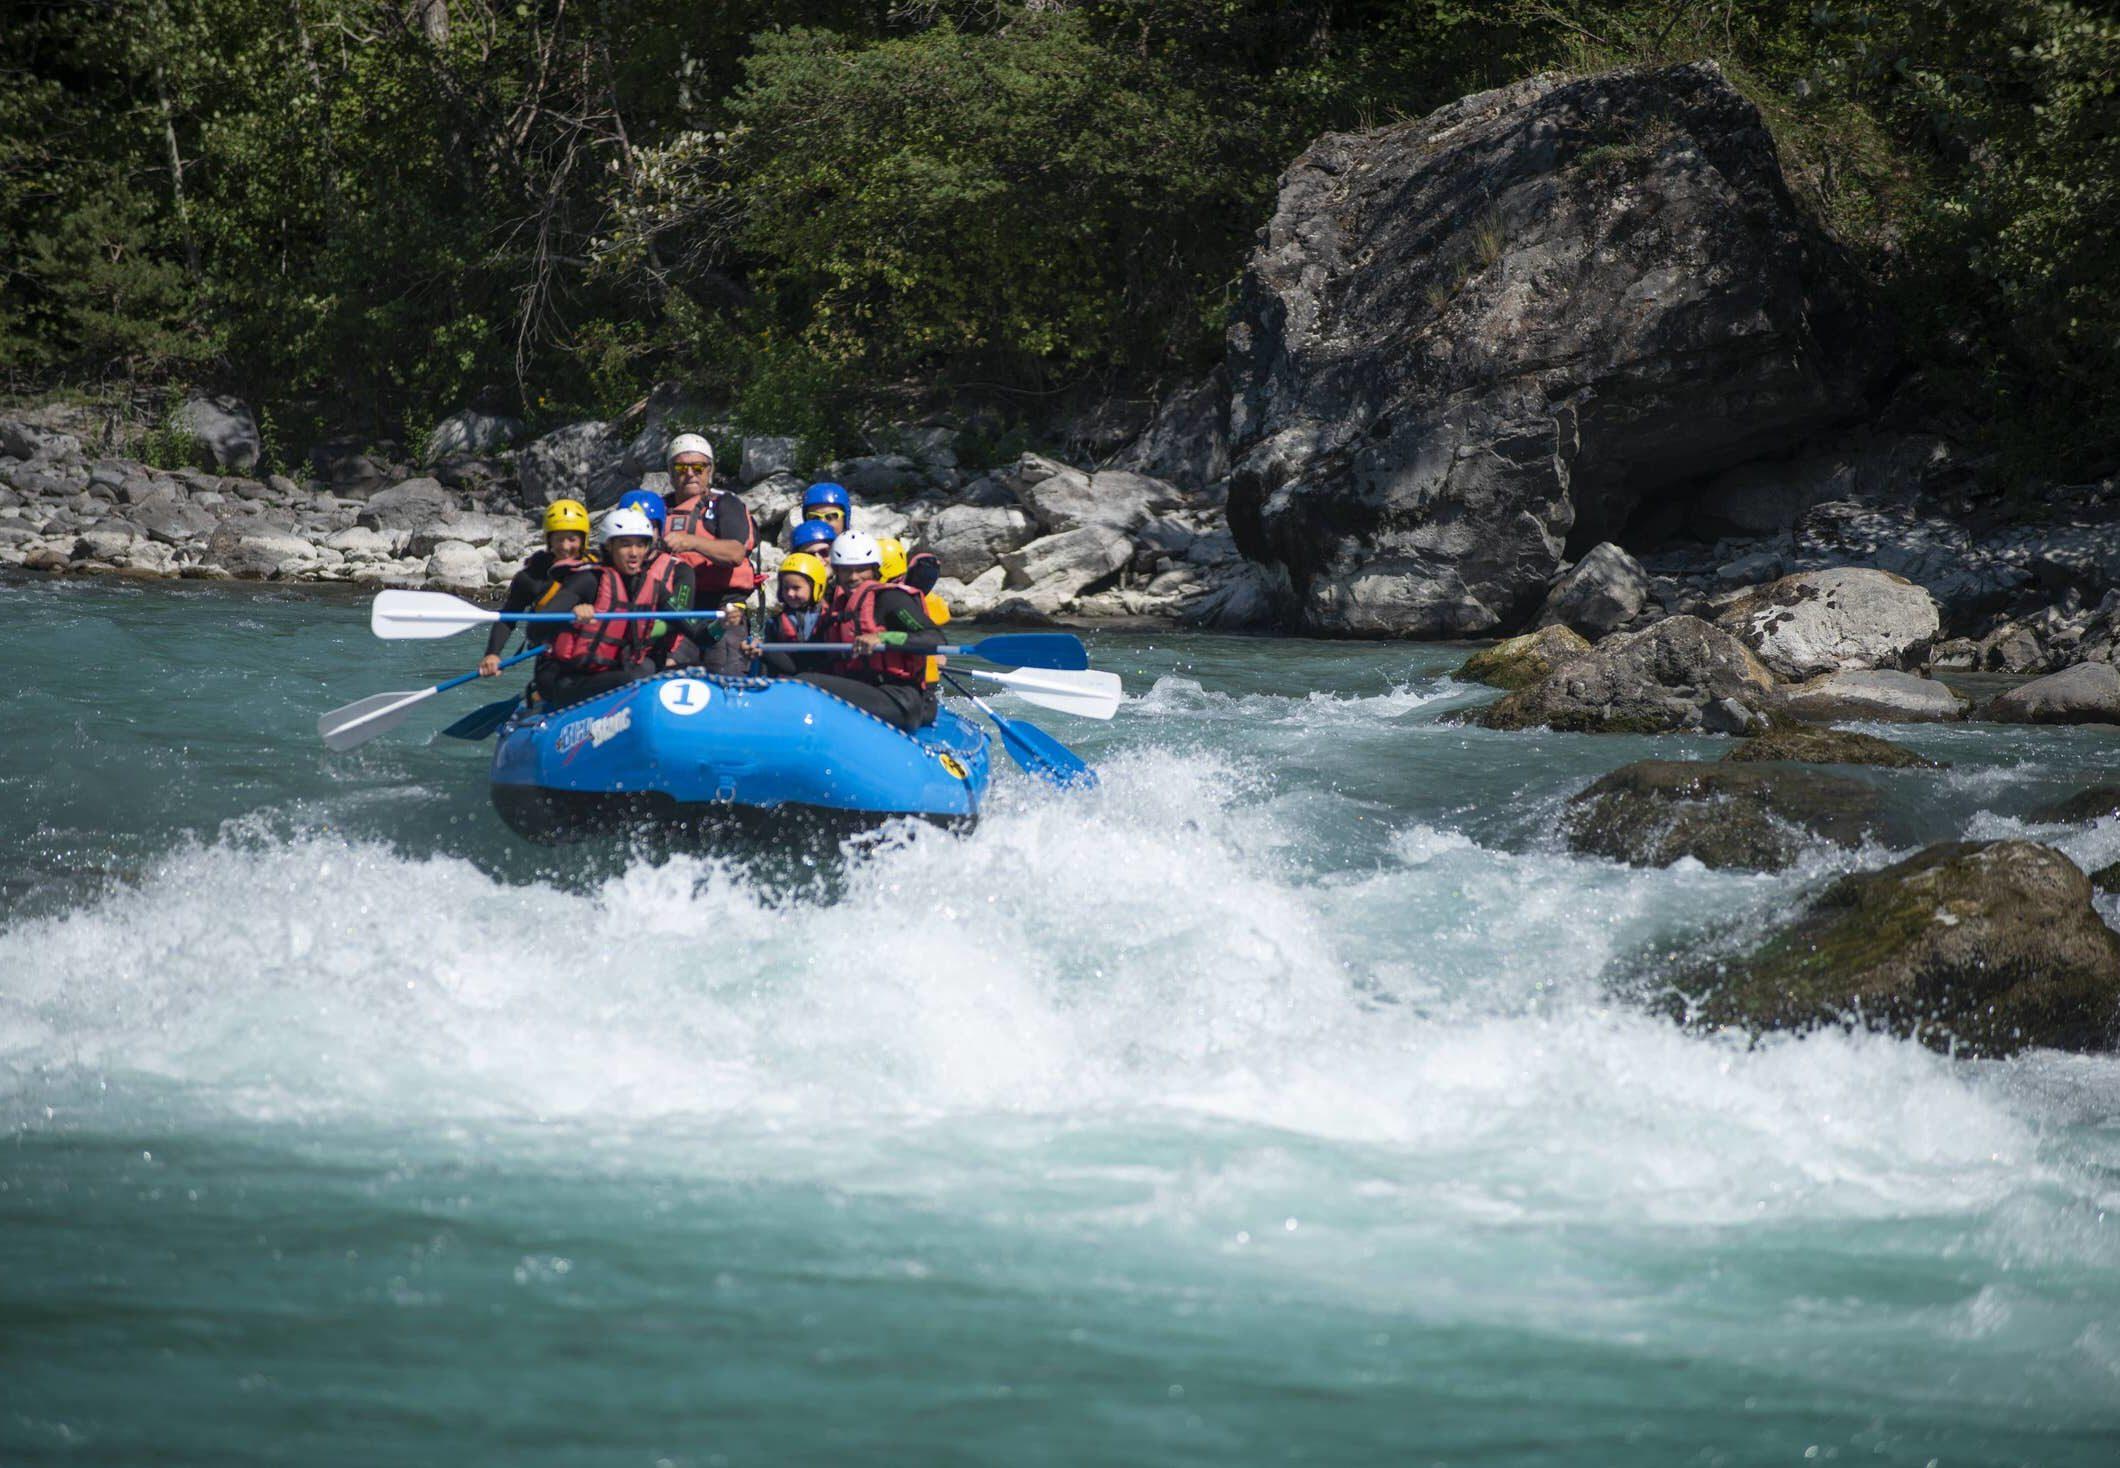 Serre-Poncon-28.08.2018-Rafting-09-min